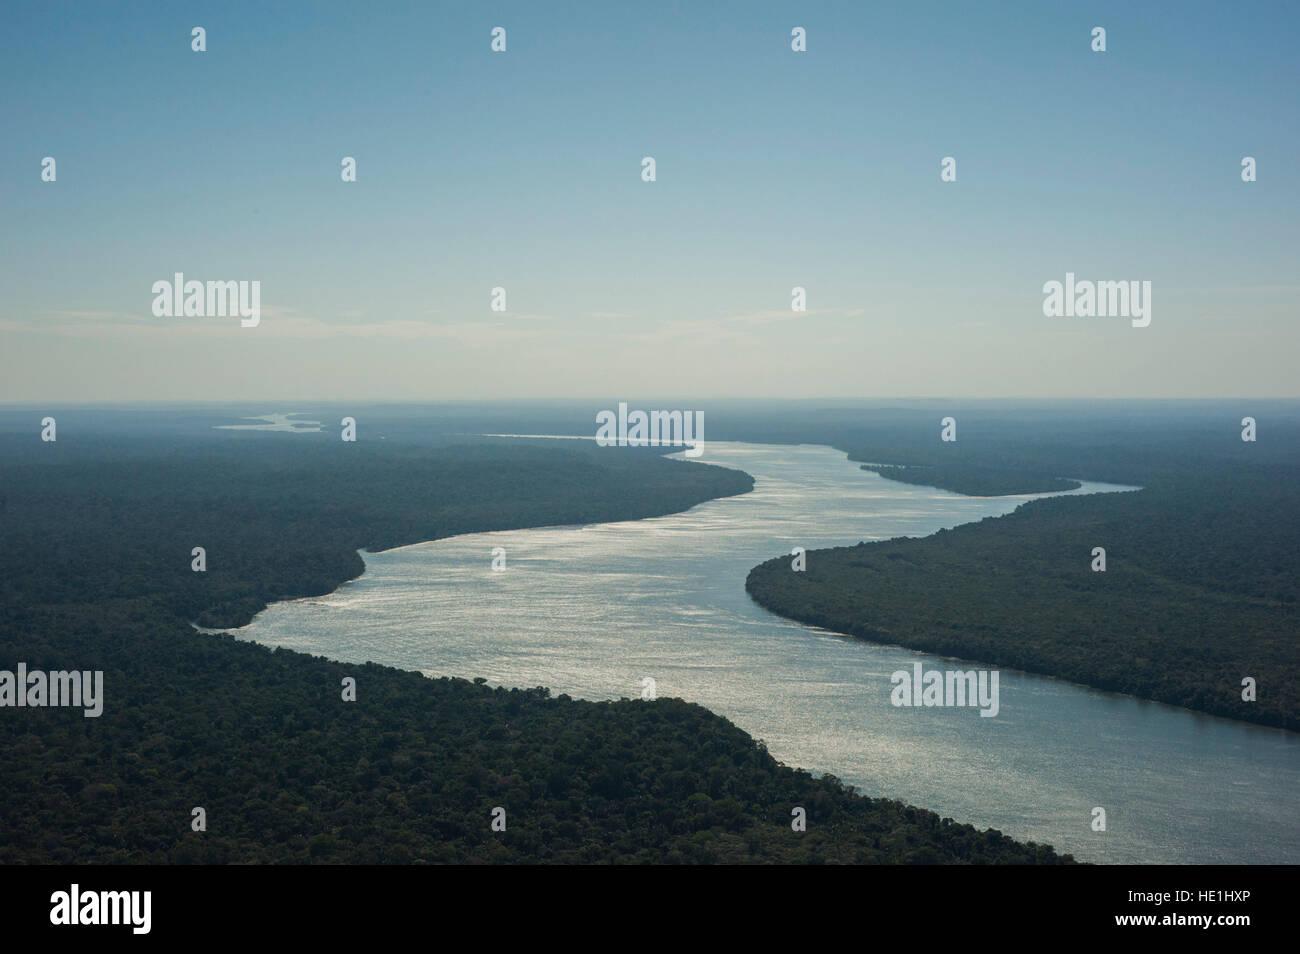 Juruena aerial view taken at the Juruena National Park, Brazil. - Stock Image